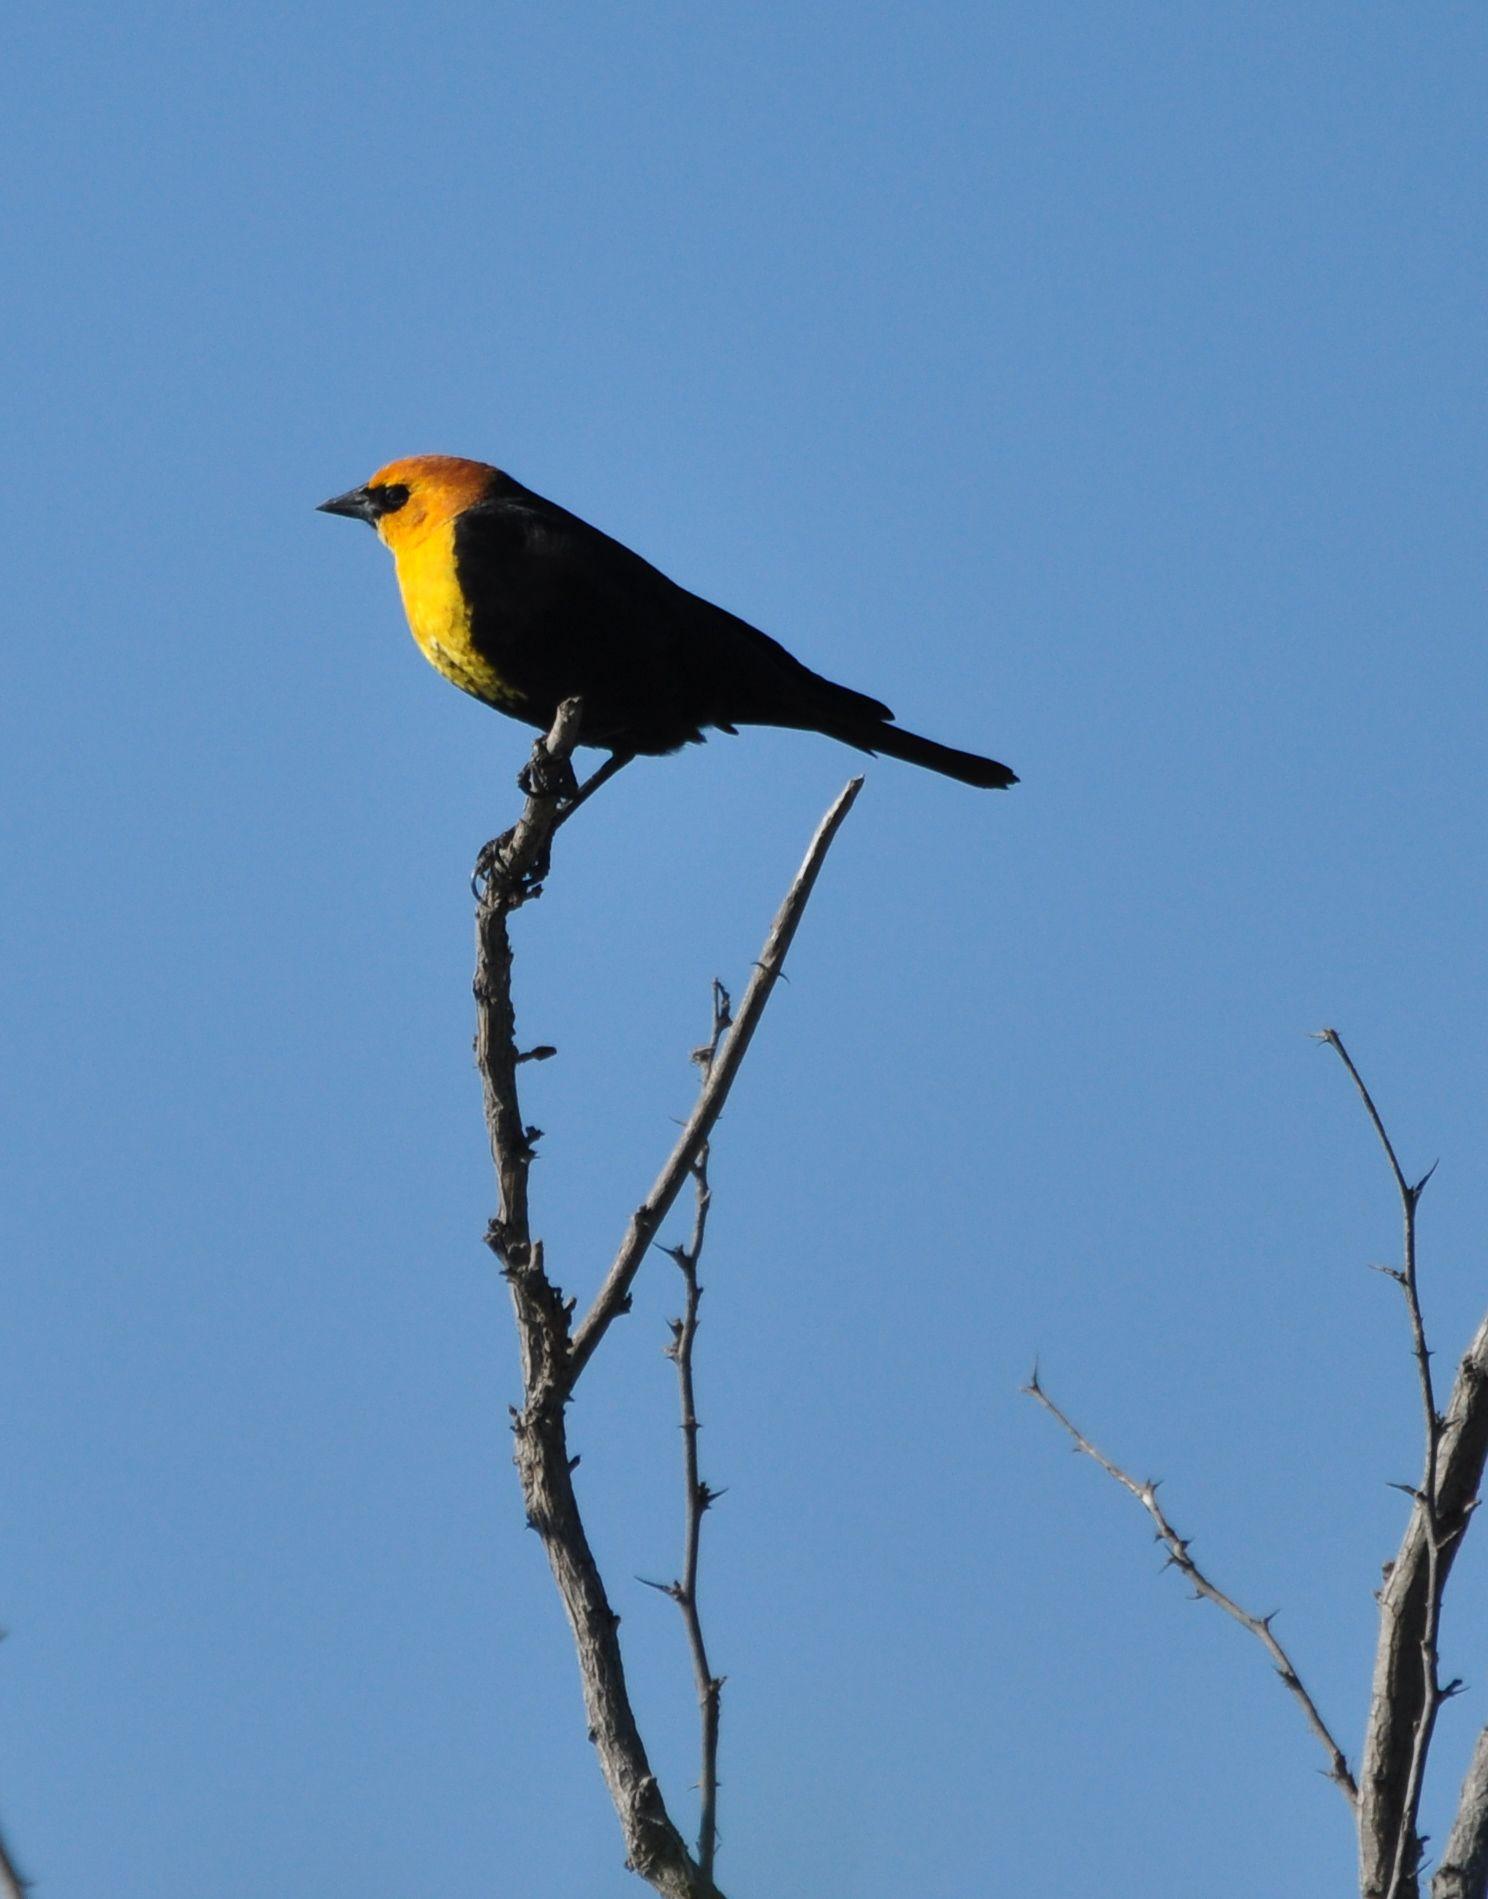 Yellowheaded Blackbird; Mitchell Lake Audubon Center, San